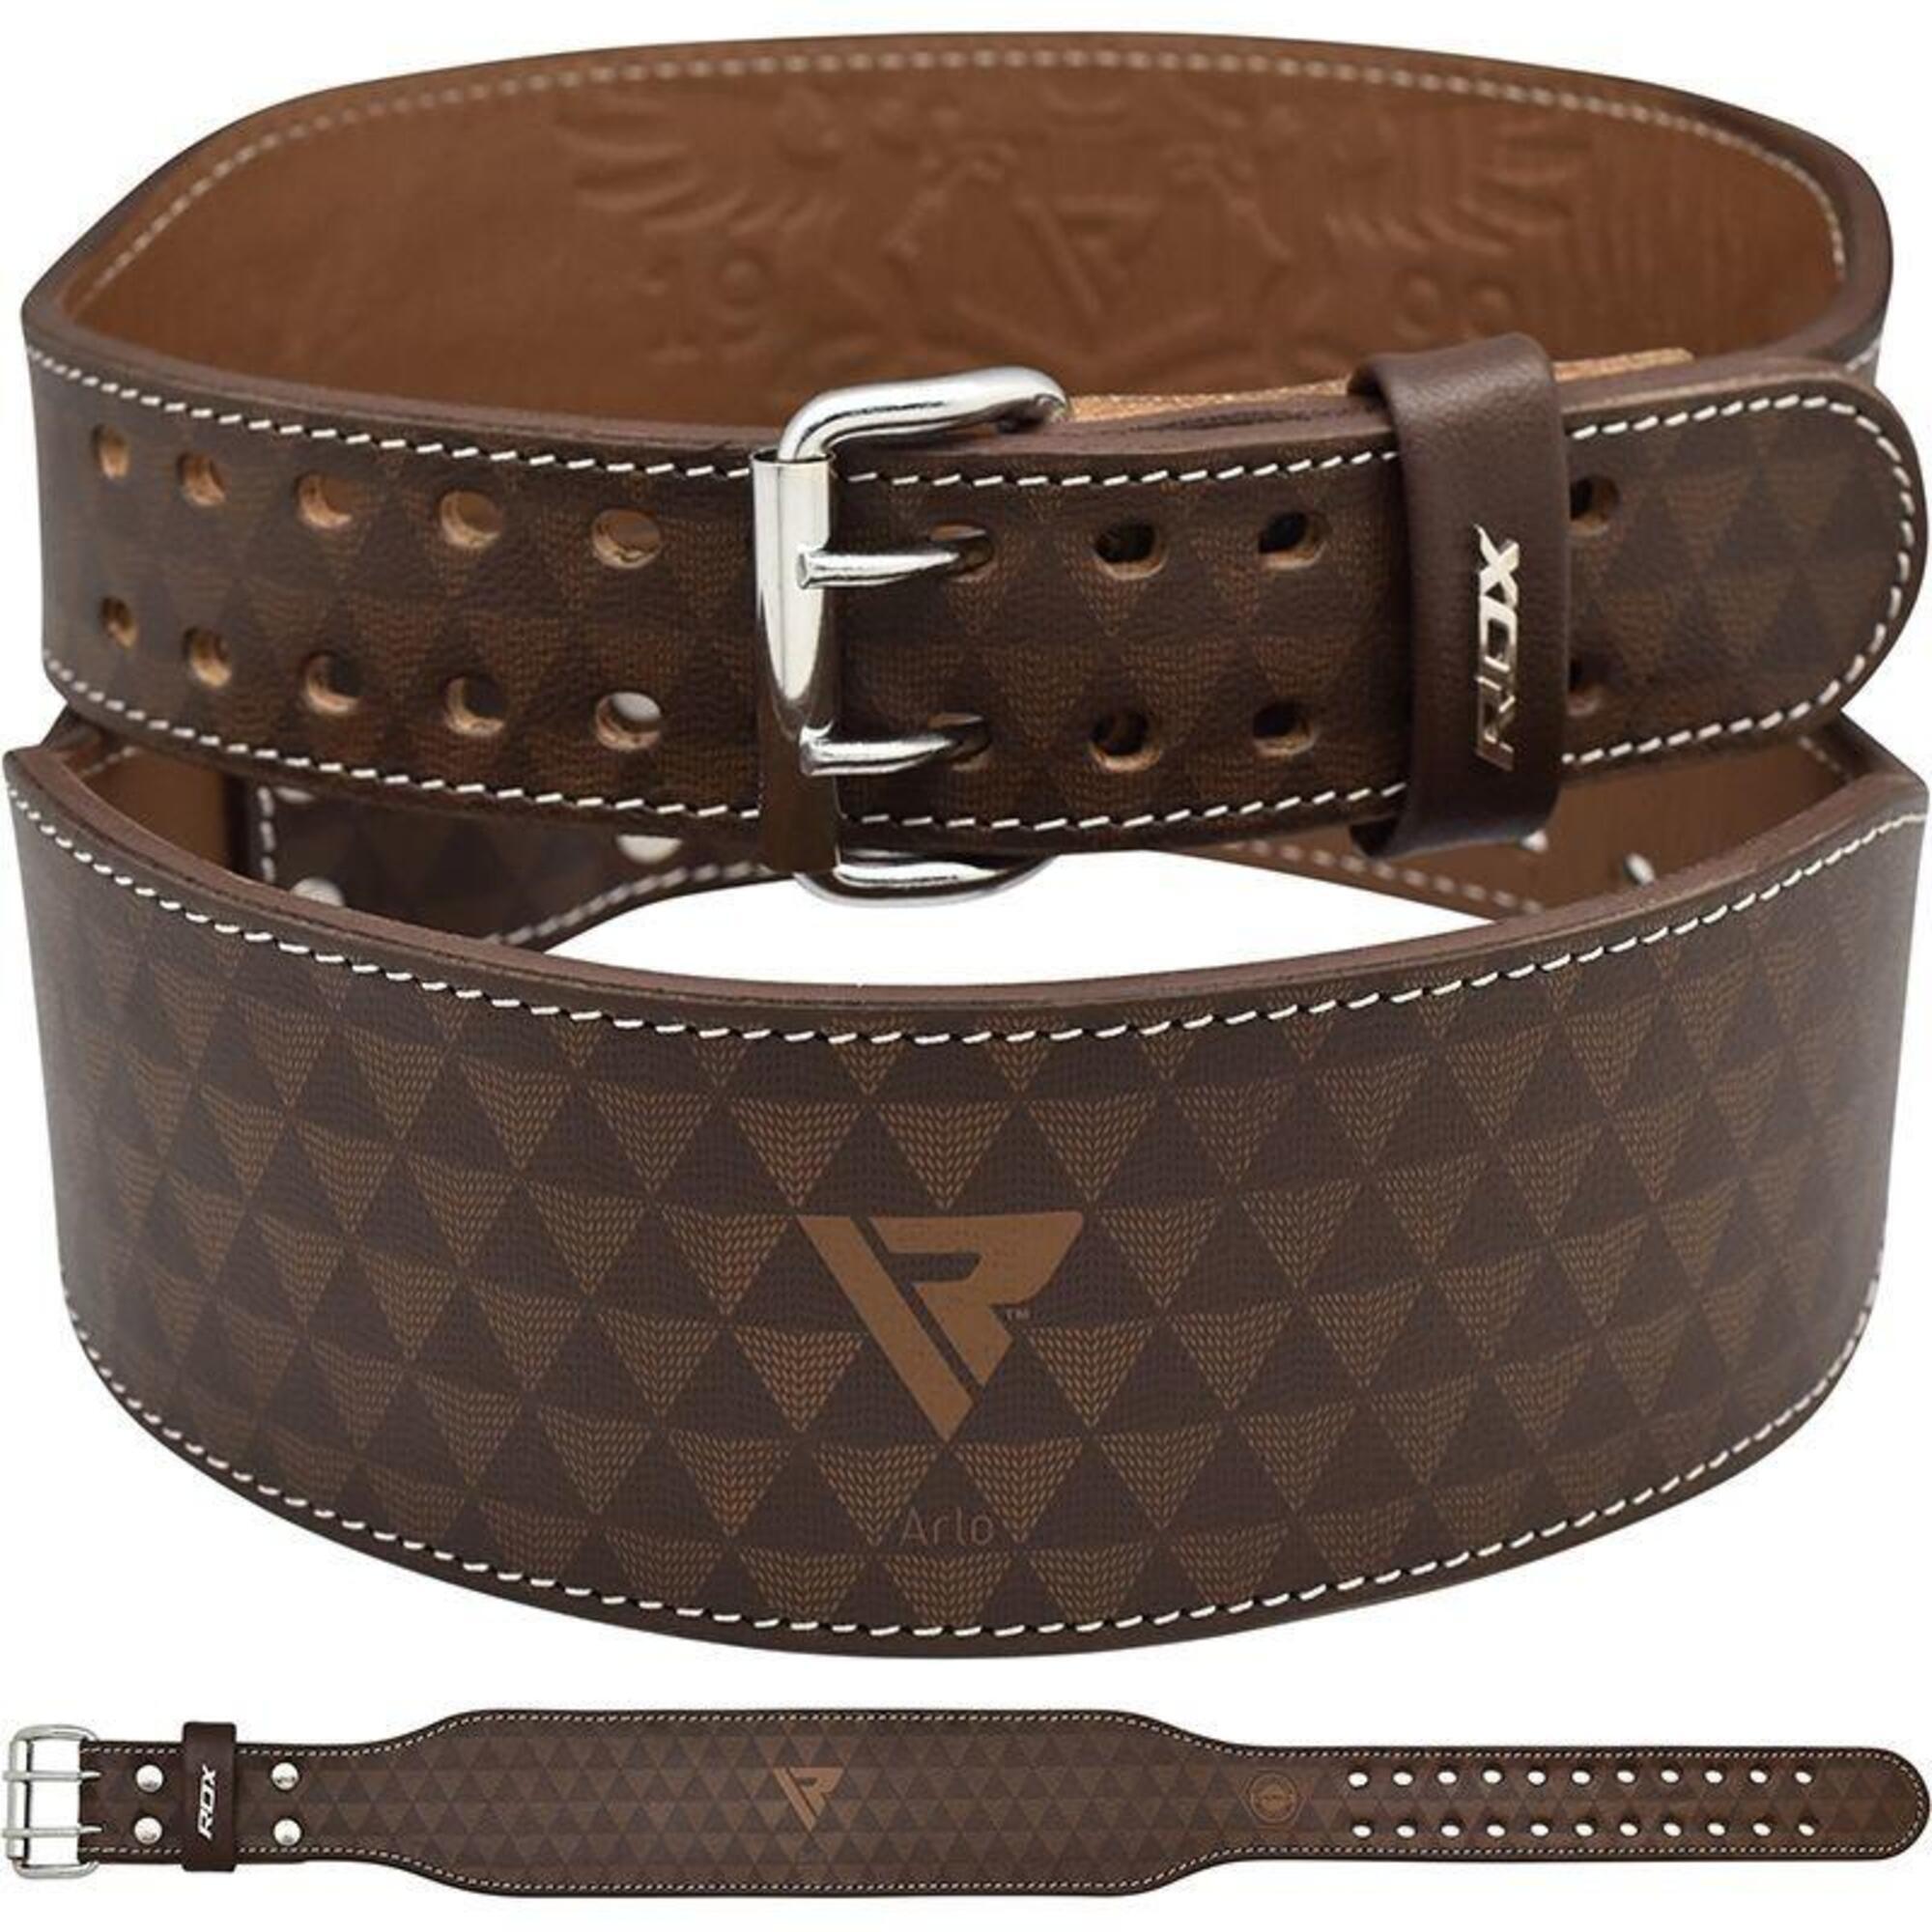 ARLO 4 Inch Medium Tan Leather Weightlifting Belt - Maat: S